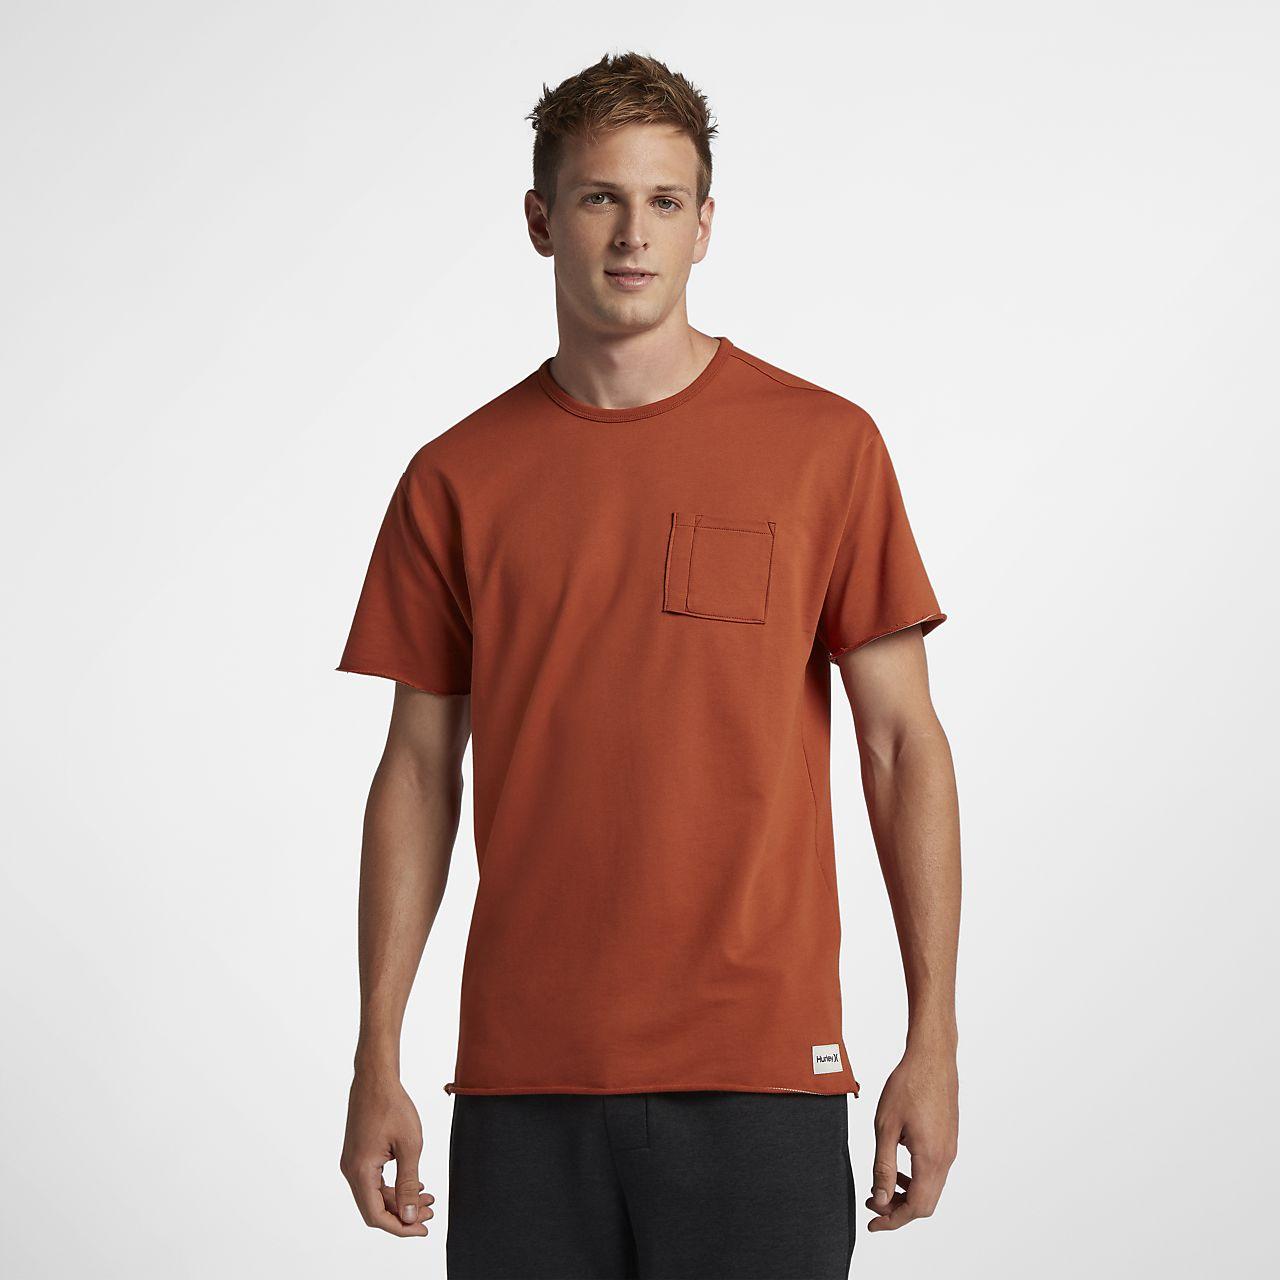 Hurley L7 Pocket Crew Camiseta - Hombre